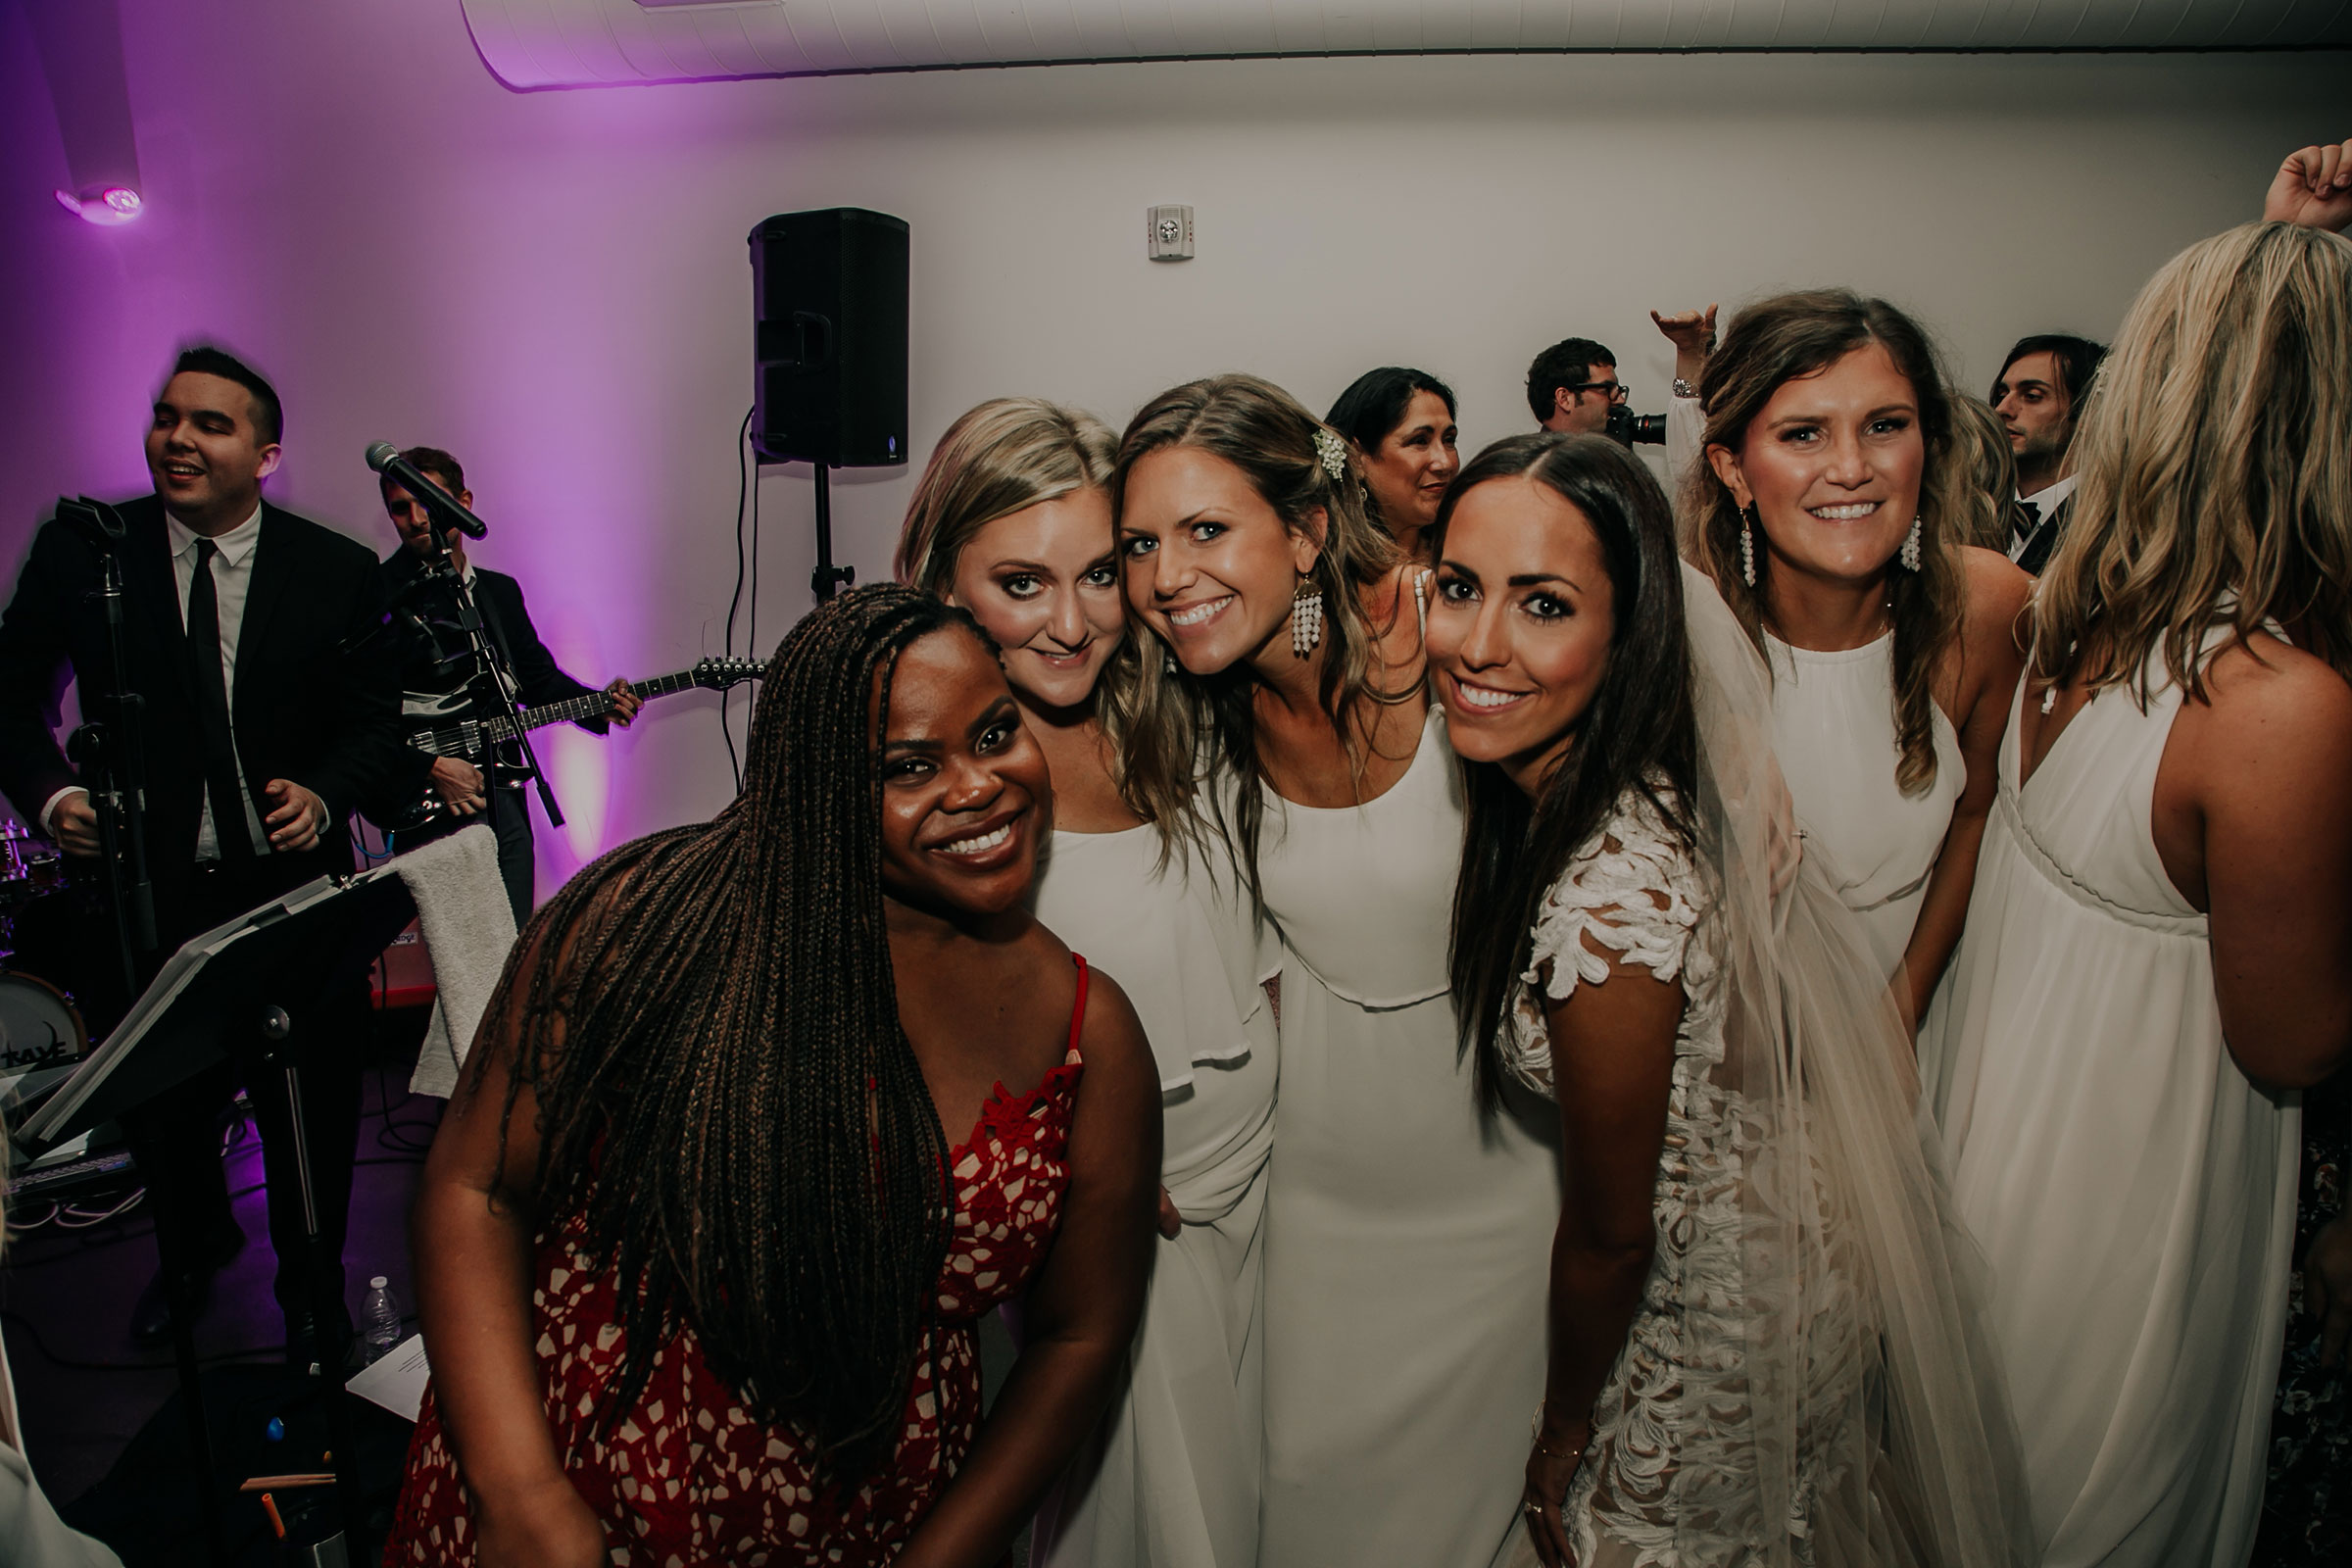 reception-dancing-with-bride-and-friends-founders-one-nine-omaha-nebraska-raelyn-ramey-photography.jpg